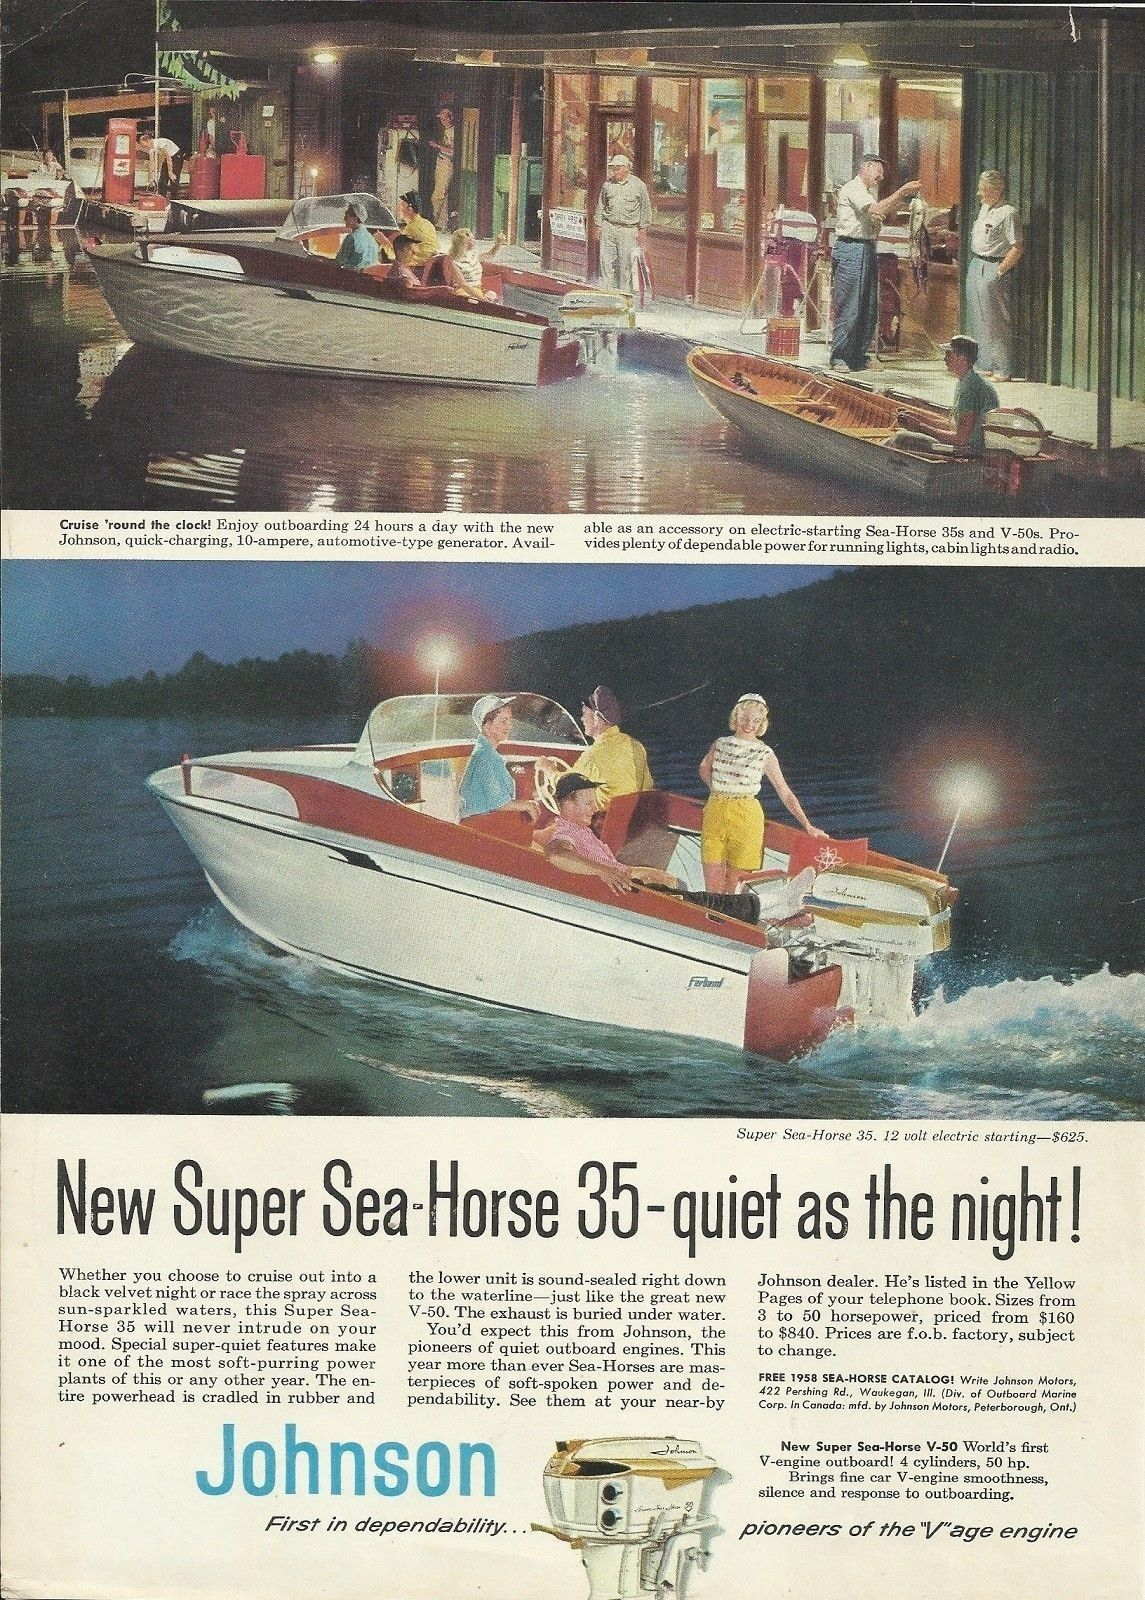 medium resolution of 1958 johnson motors color ad the super sea horse 35 hp outboard motor